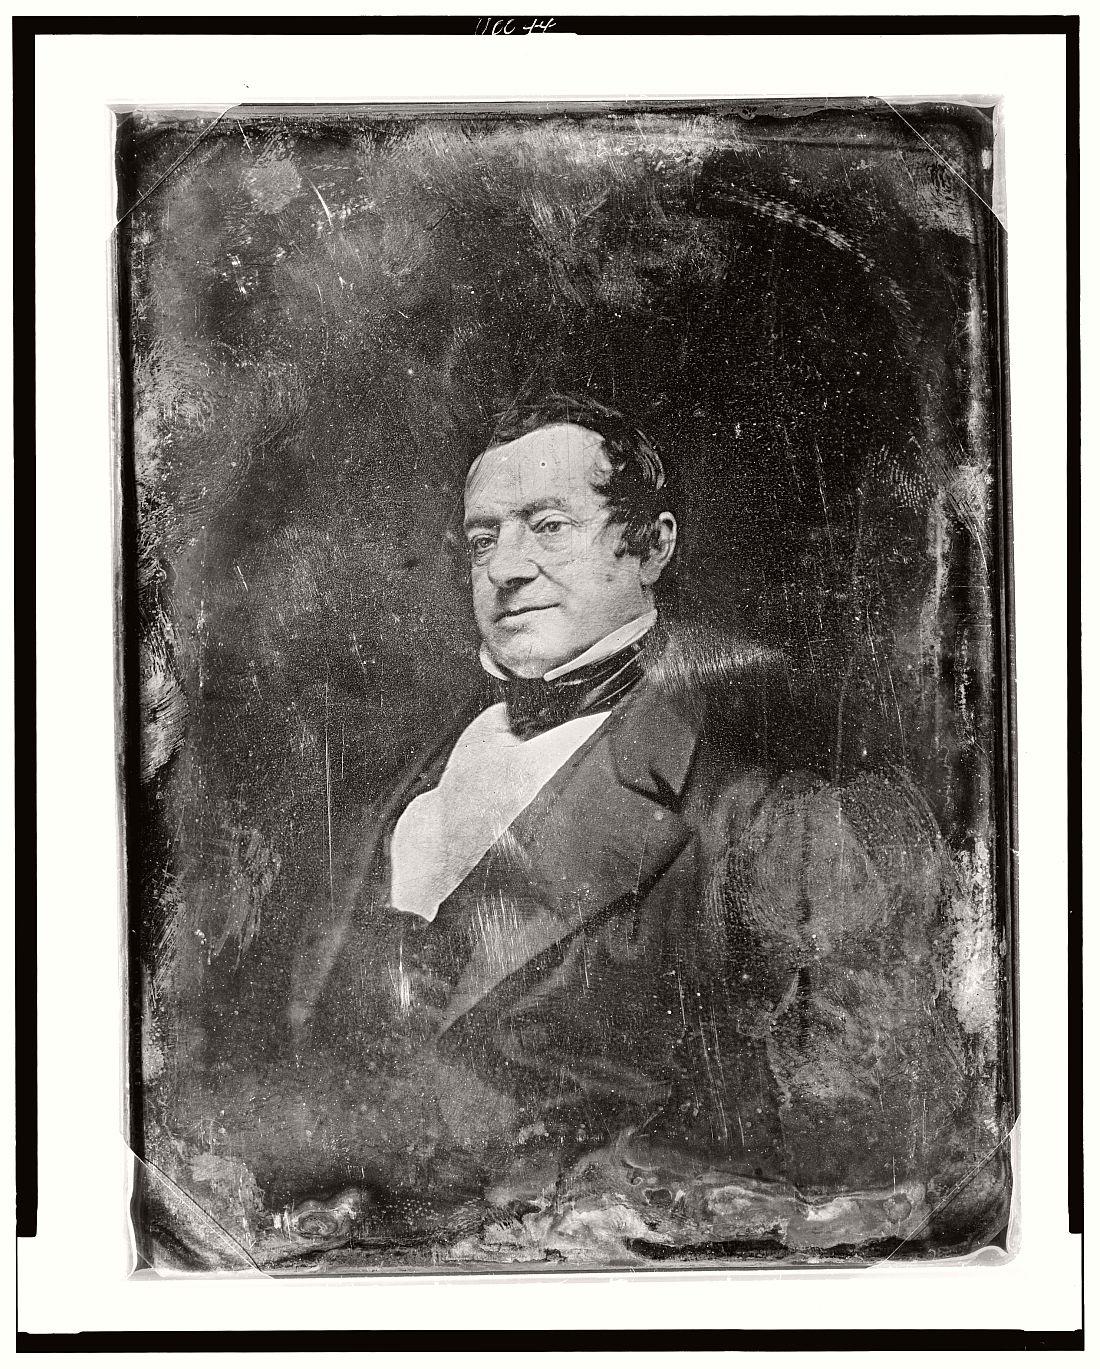 vintage-daguerreotype-portraits-from-xix-century-1844-1860-52